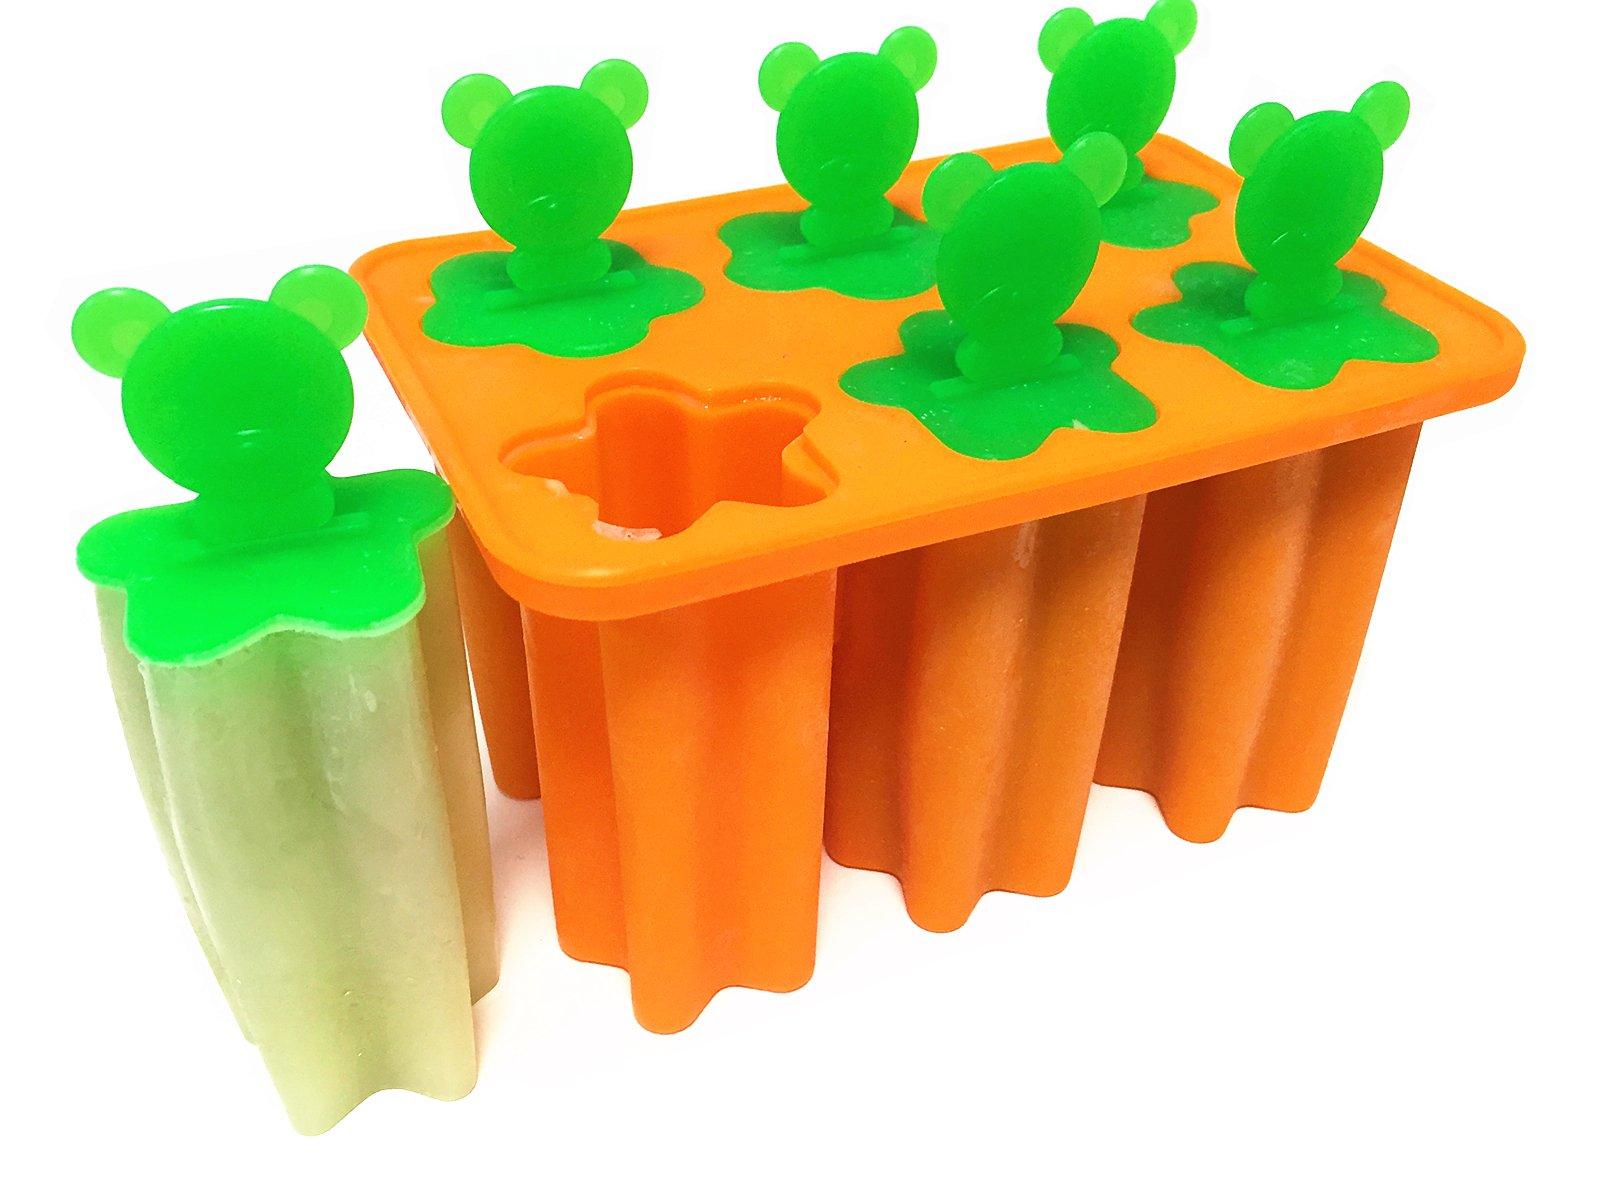 EPHome Platinum Silicone Ice Pop Mold Popsicle Maker Frozen Pop Tray, Pop Sticks Included (1, Orange)